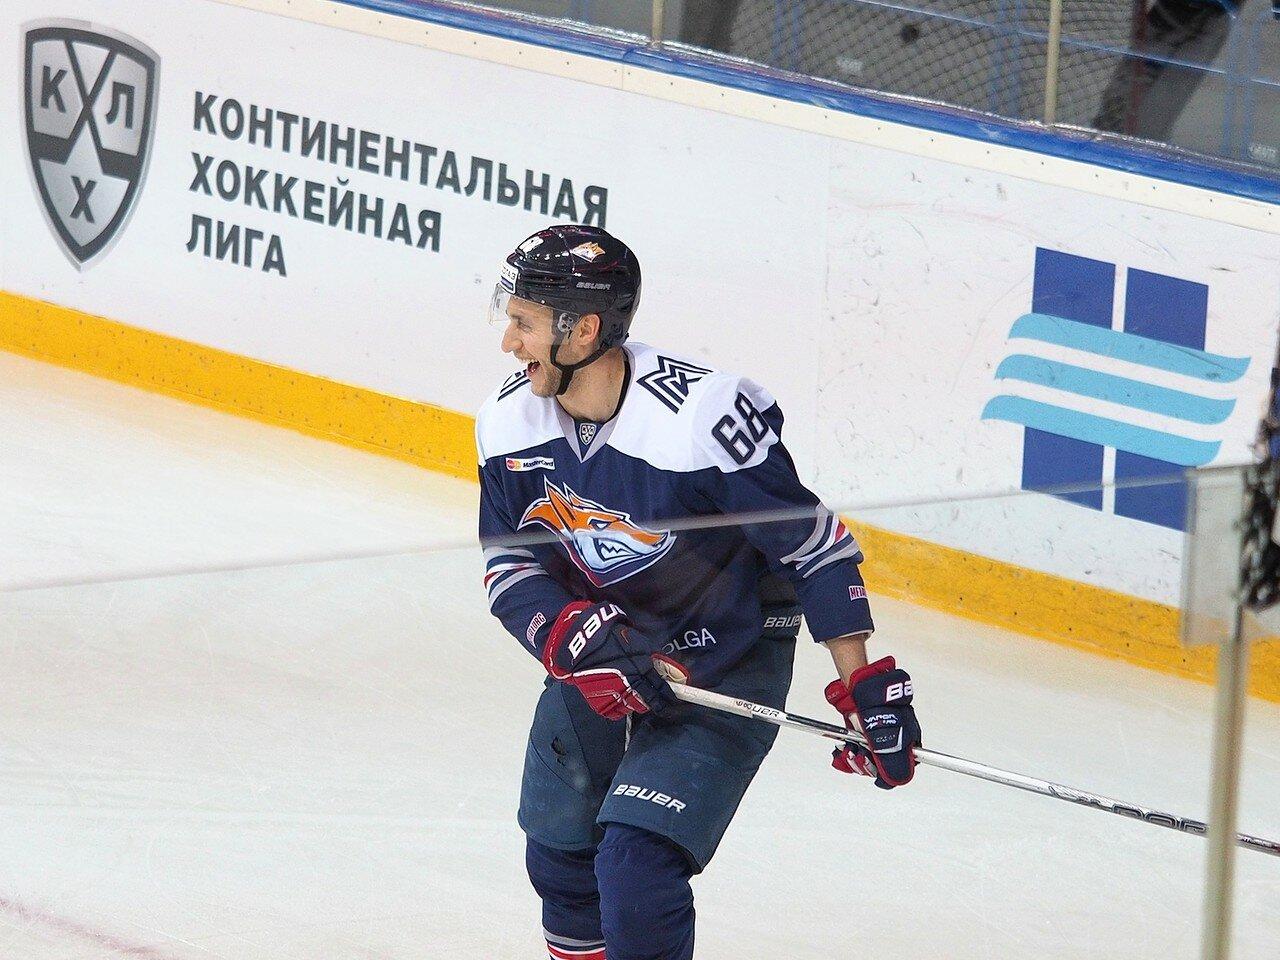 33 Ярослав Косов Металлург - Локомотив 23.11.2016